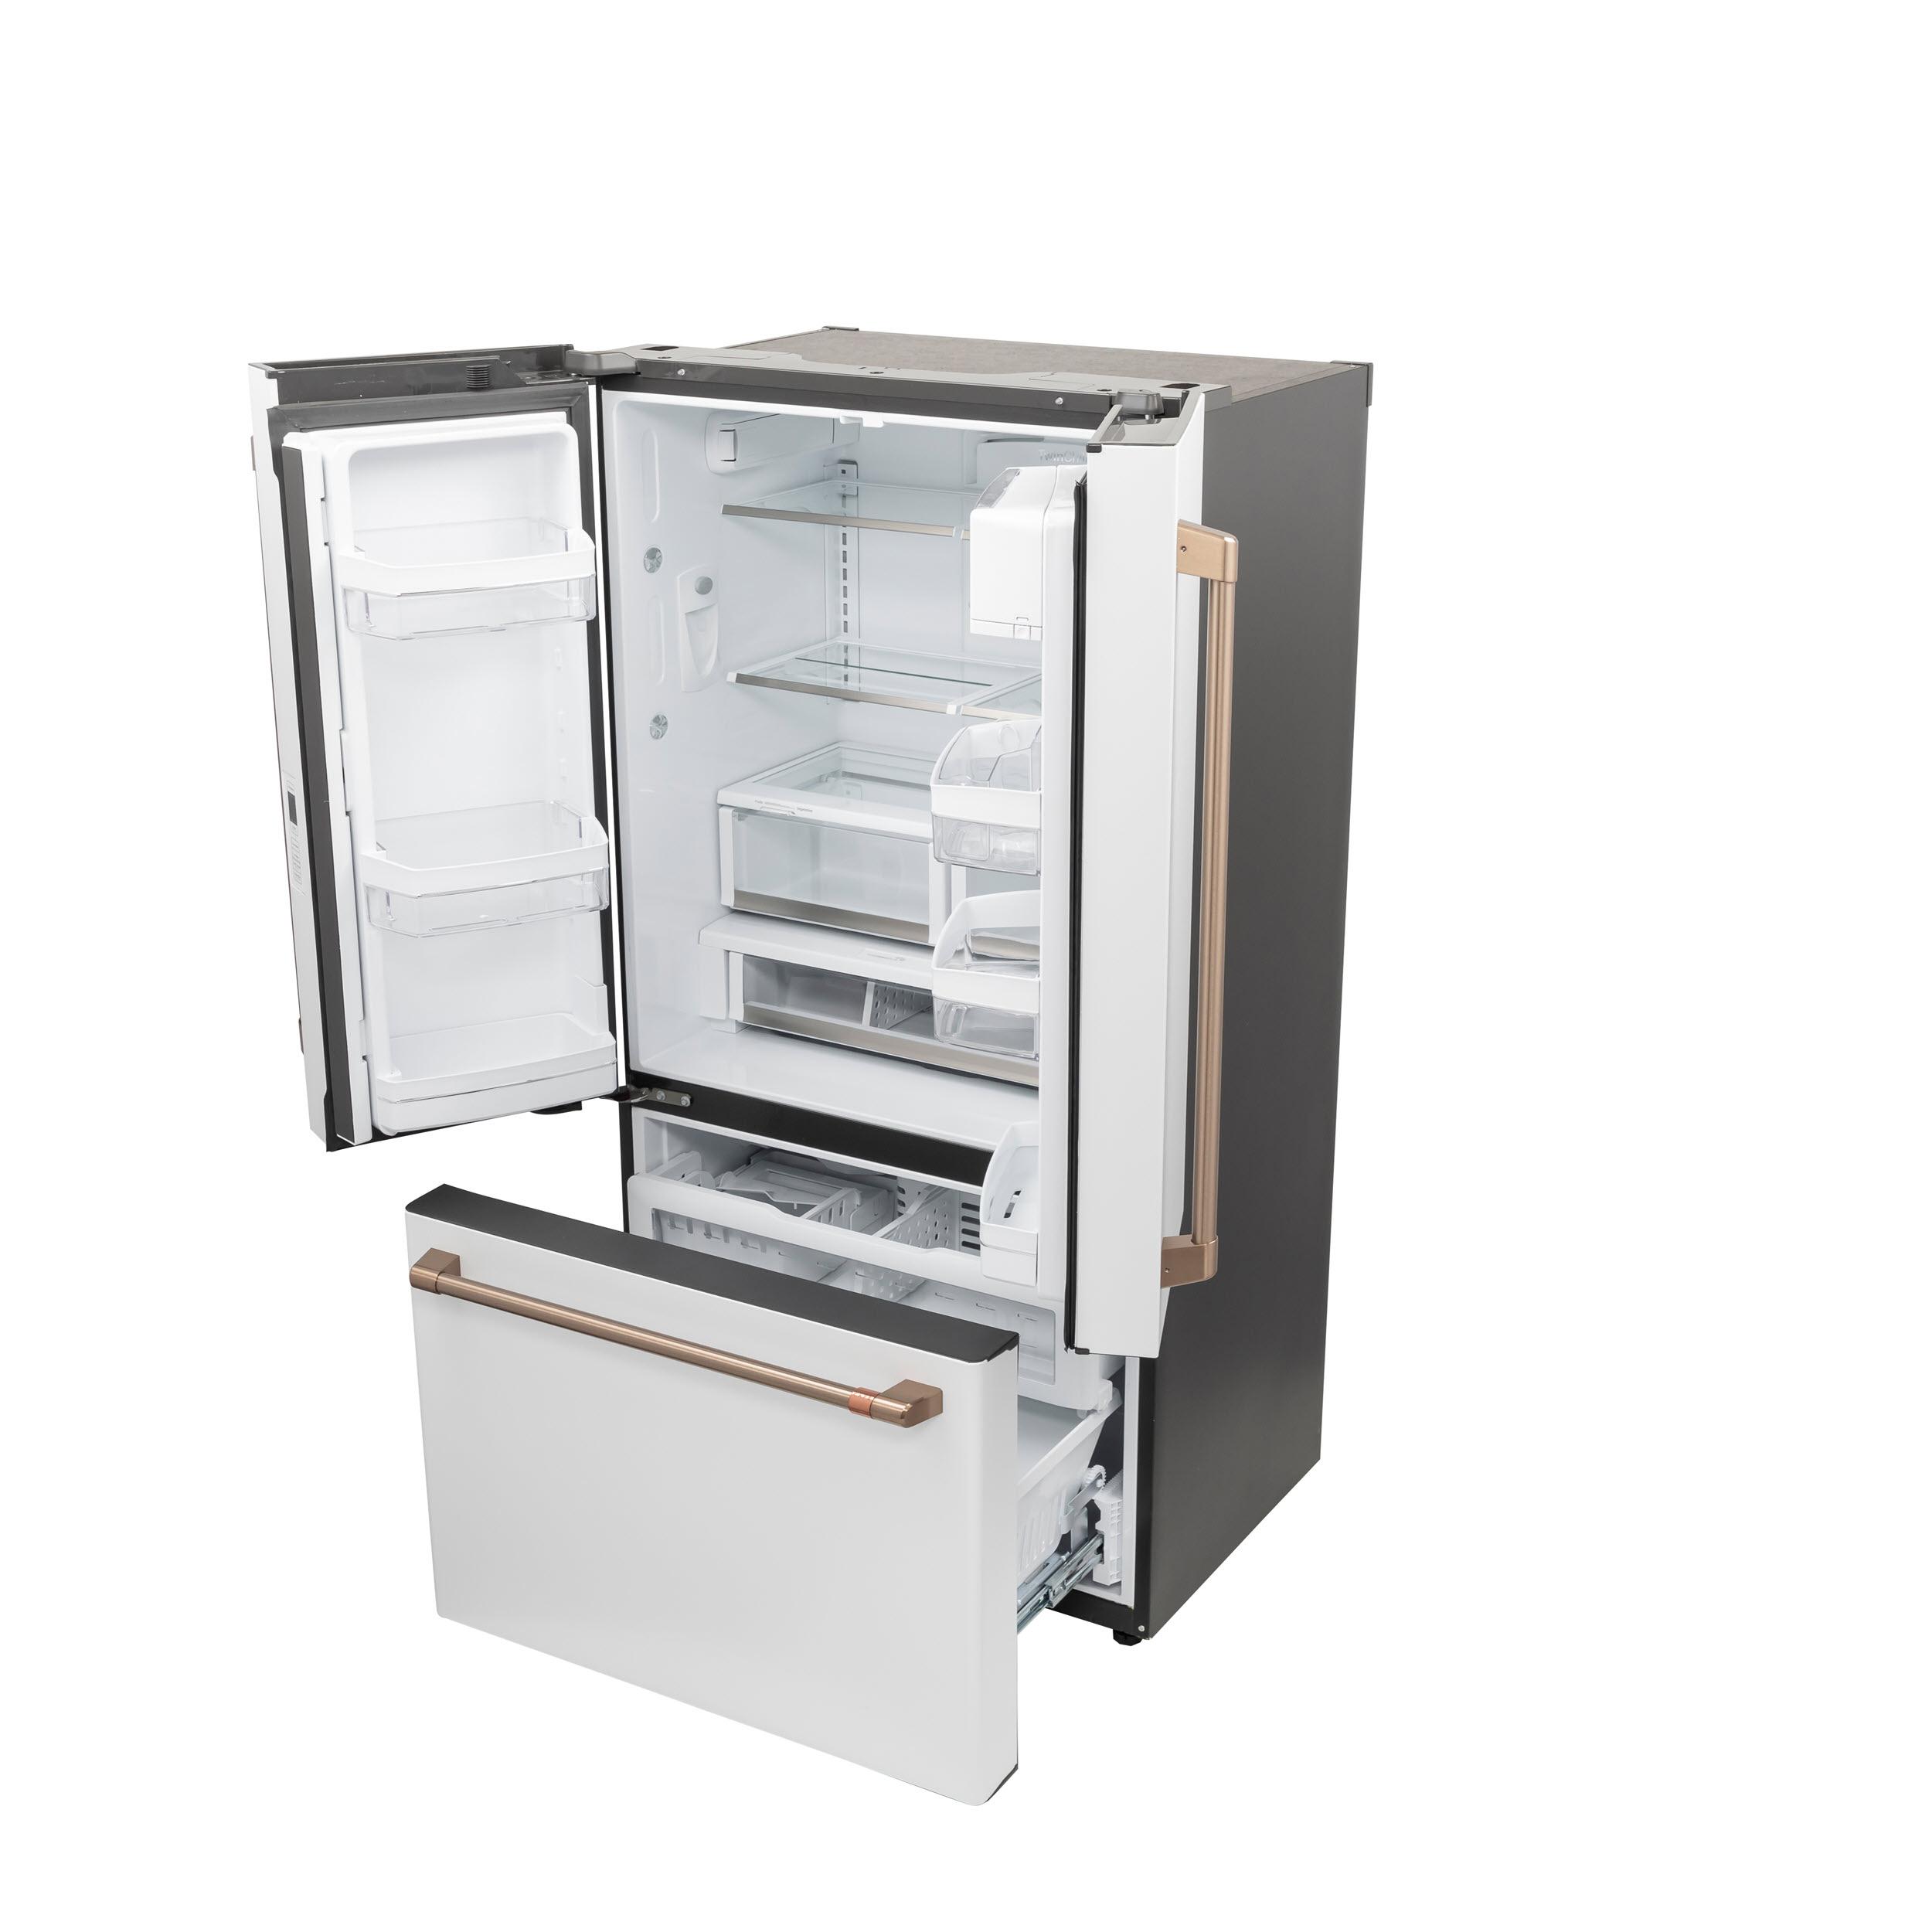 Model: CWE23SP4MW2 | Cafe Café™ ENERGY STAR® 23.1 Cu. Ft. Smart Counter-Depth French-Door Refrigerator